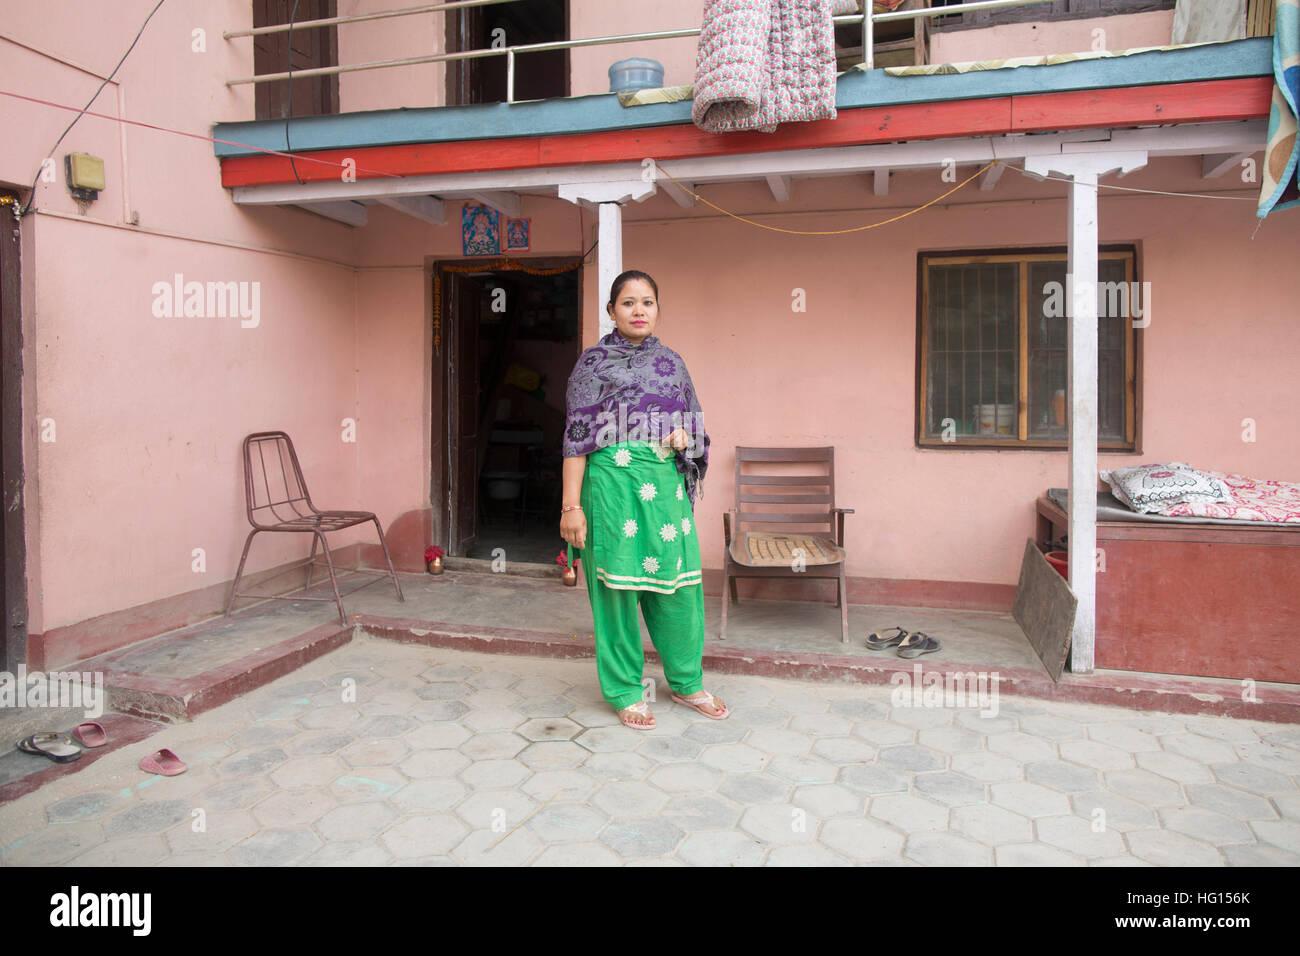 kathmandu, nepal. 6th dec, 2016. rajani bhandari, a former